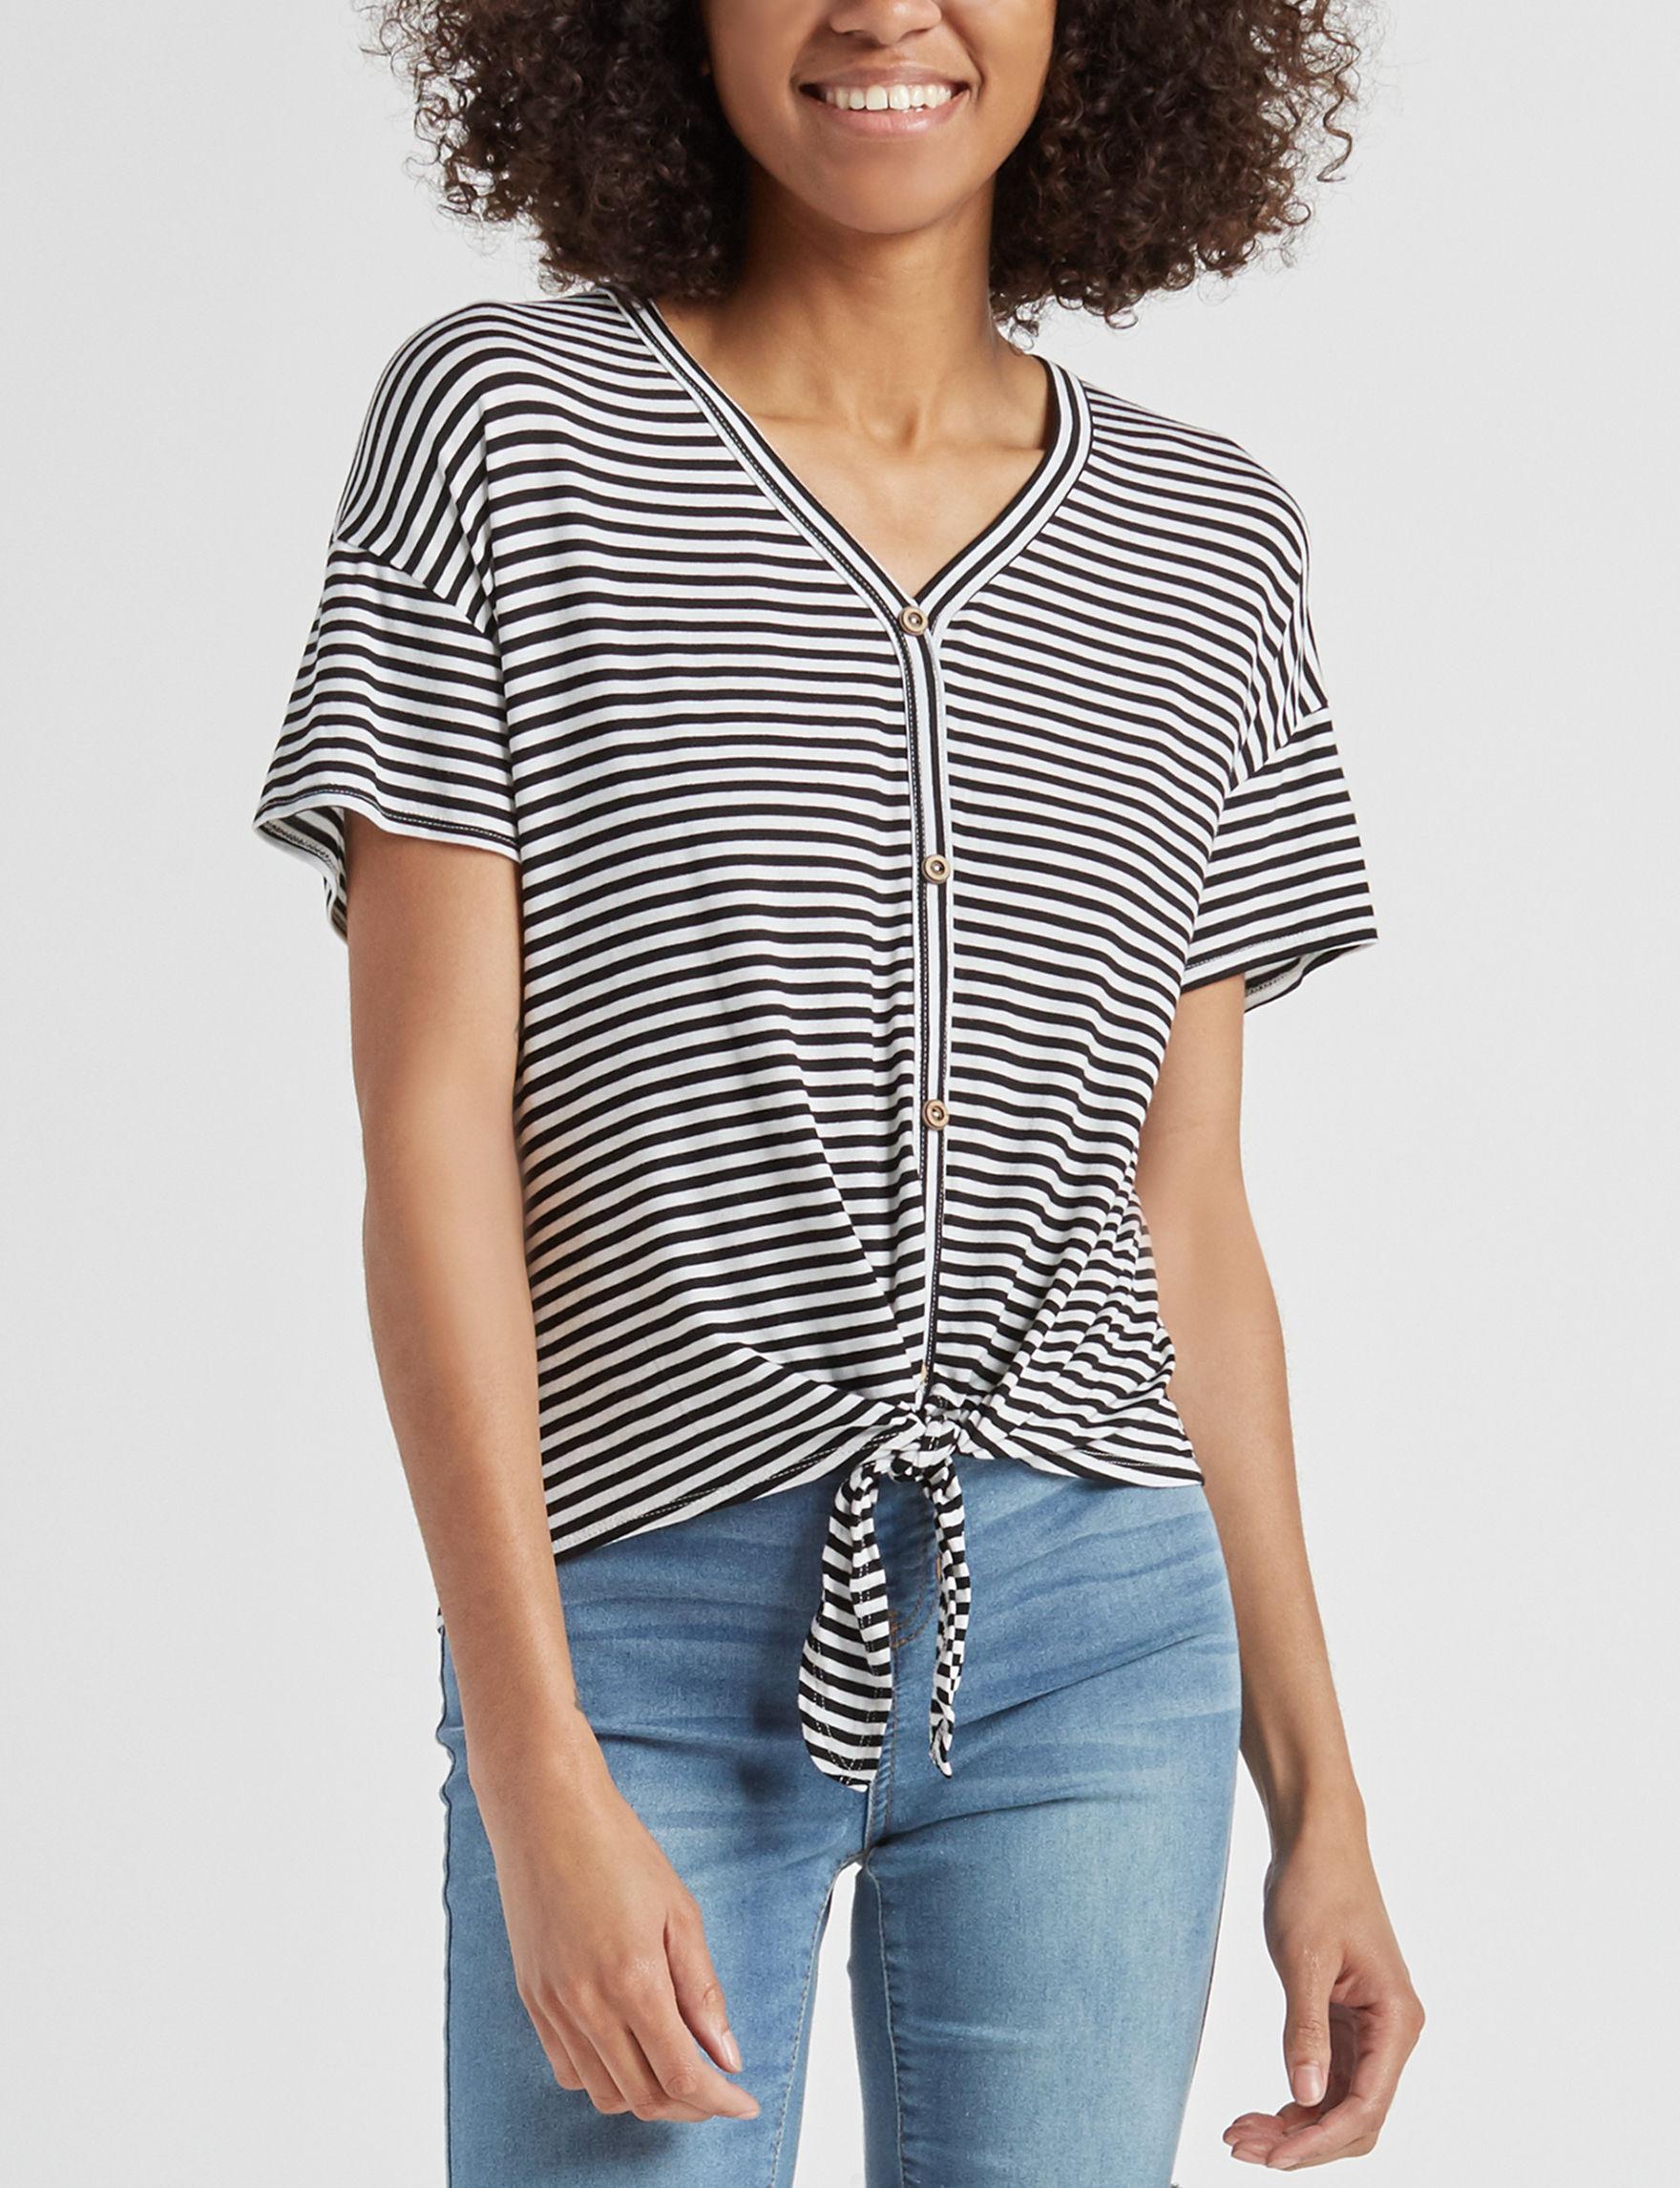 Liberty Love Black / White Shirts & Blouses